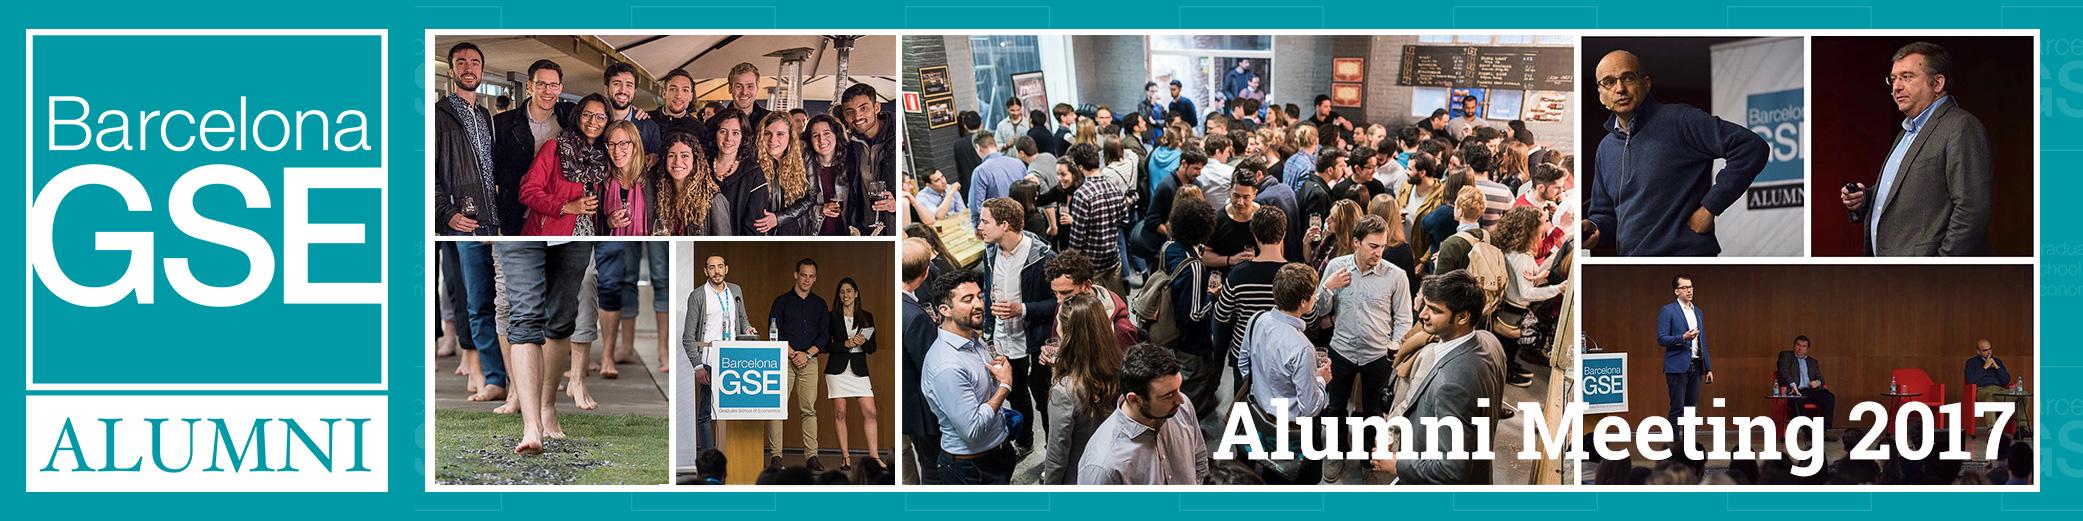 Alumni Meeting 2017